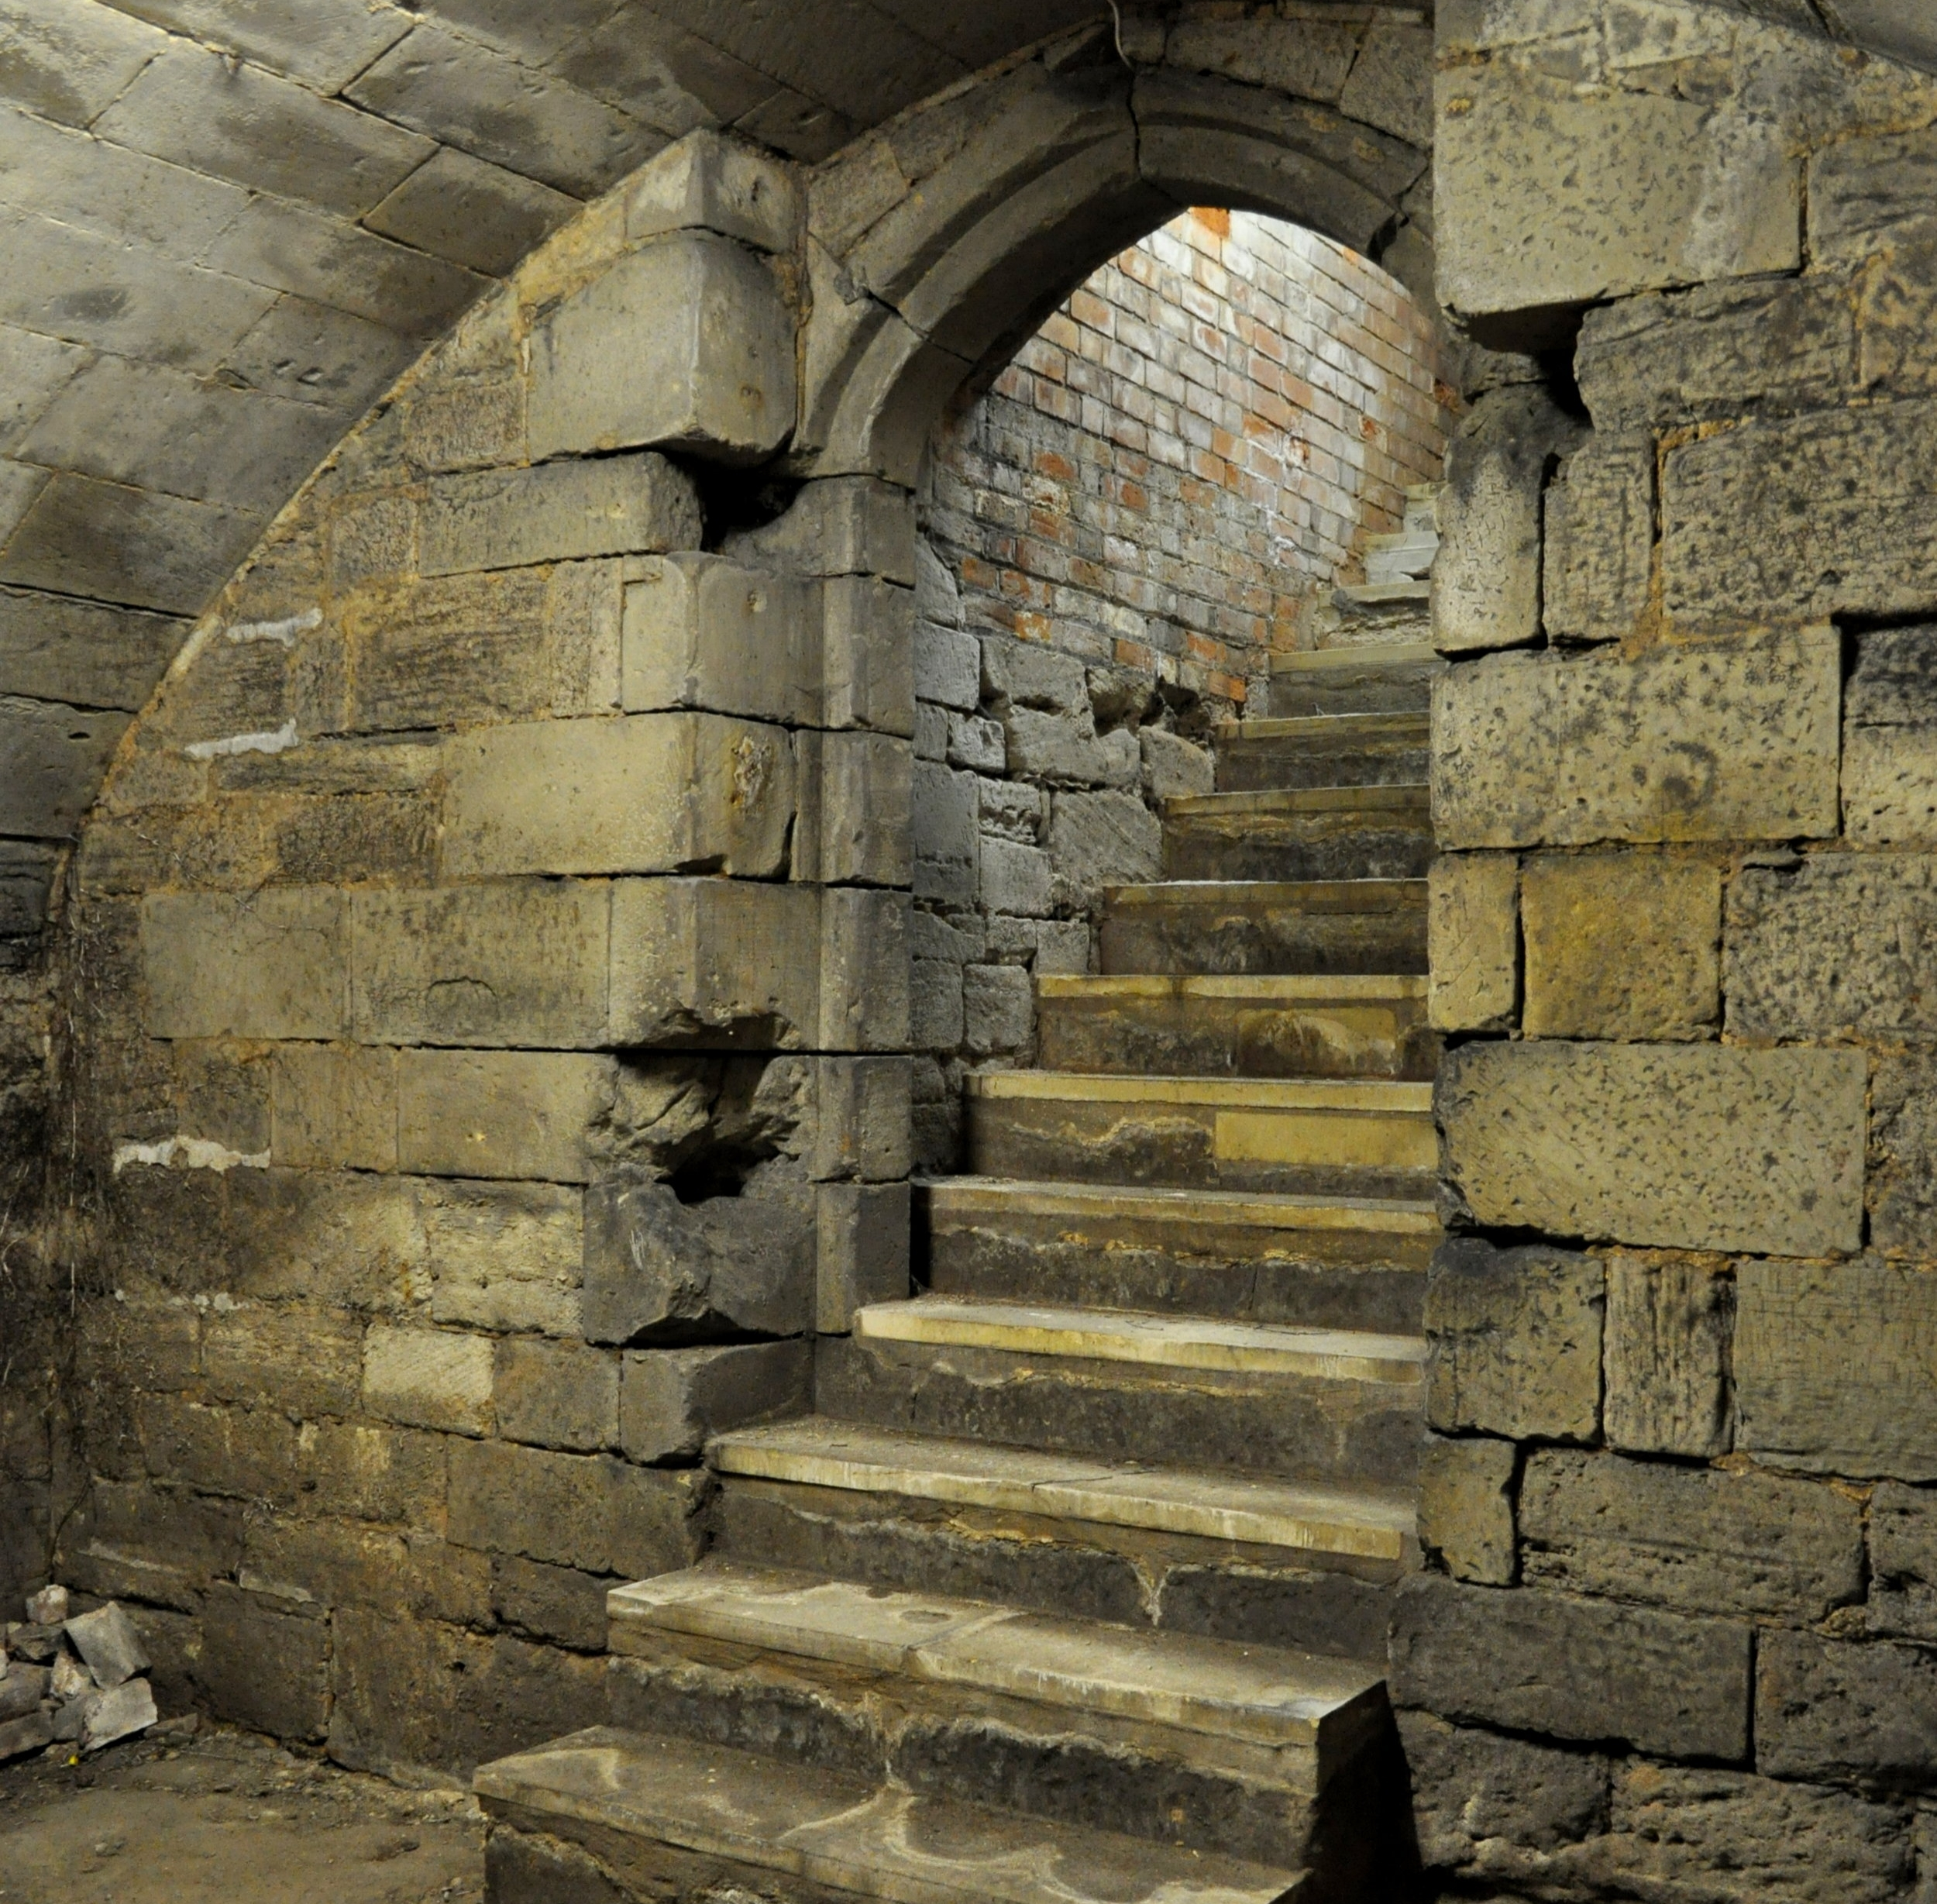 John_o_gaunts_cellar_007.jpg